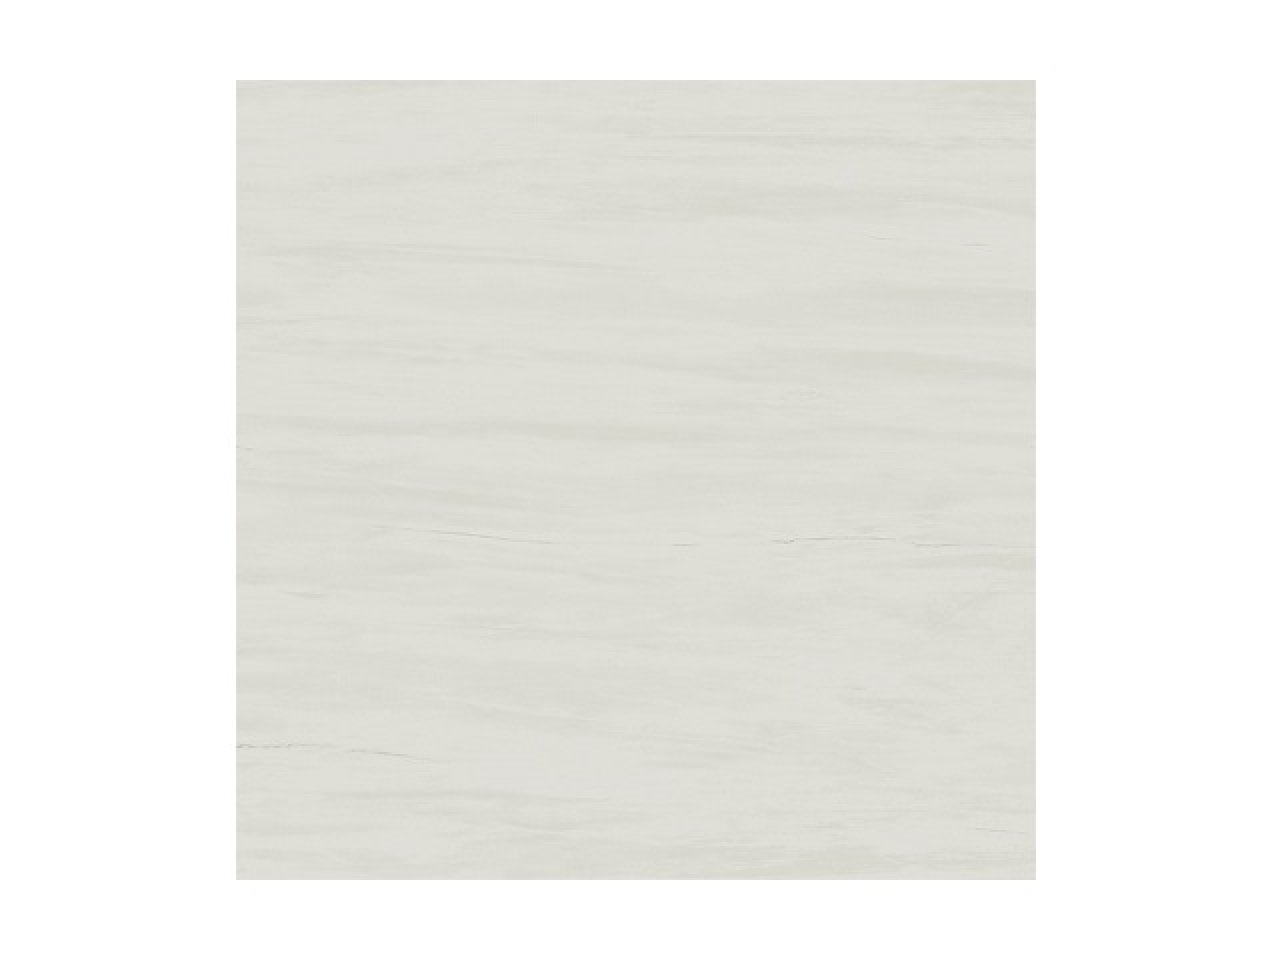 Напольная плитка Marvel Bianco Dolomite Lapp. 75x75